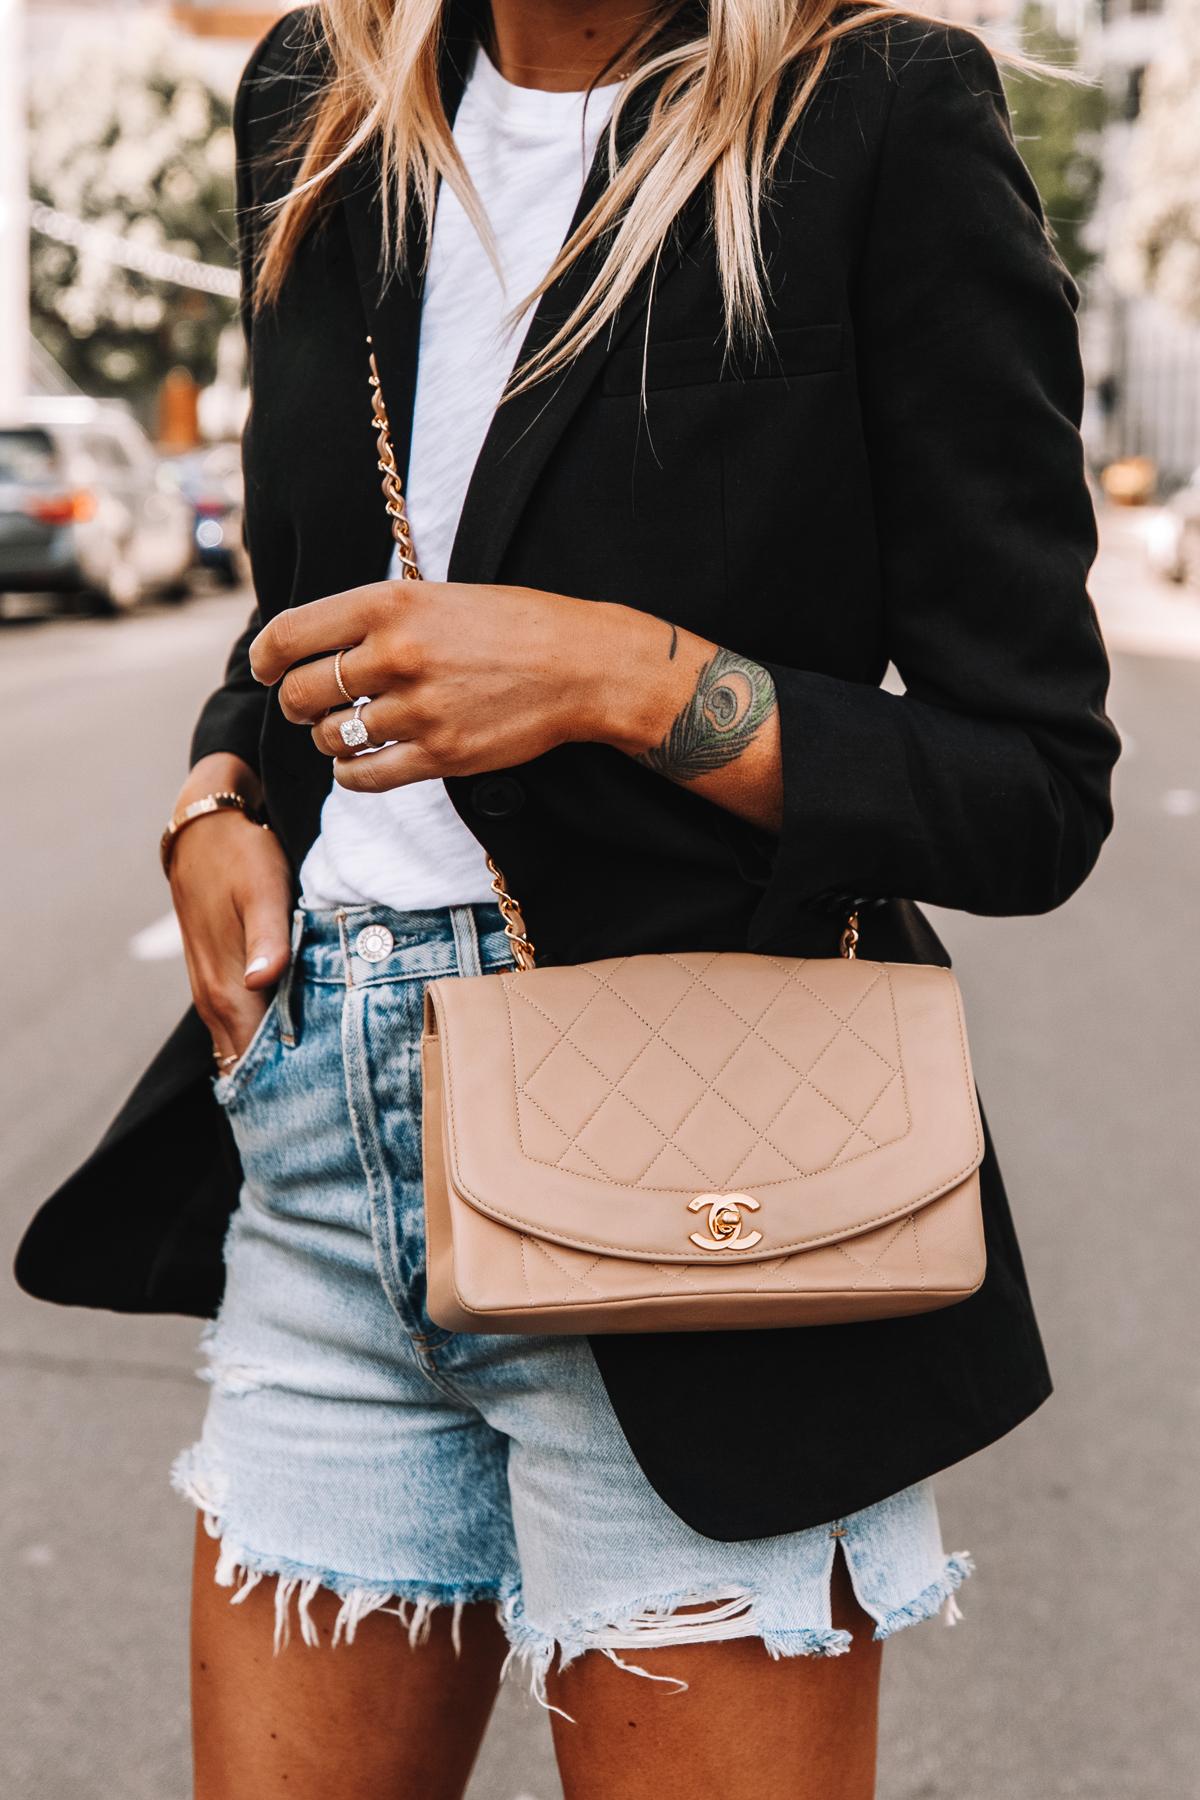 Fashion Jackson Wearing Everlane Black Blazer White Tshirt AGOLDE High Rise Denim Shorts Beige Chanel Handbag